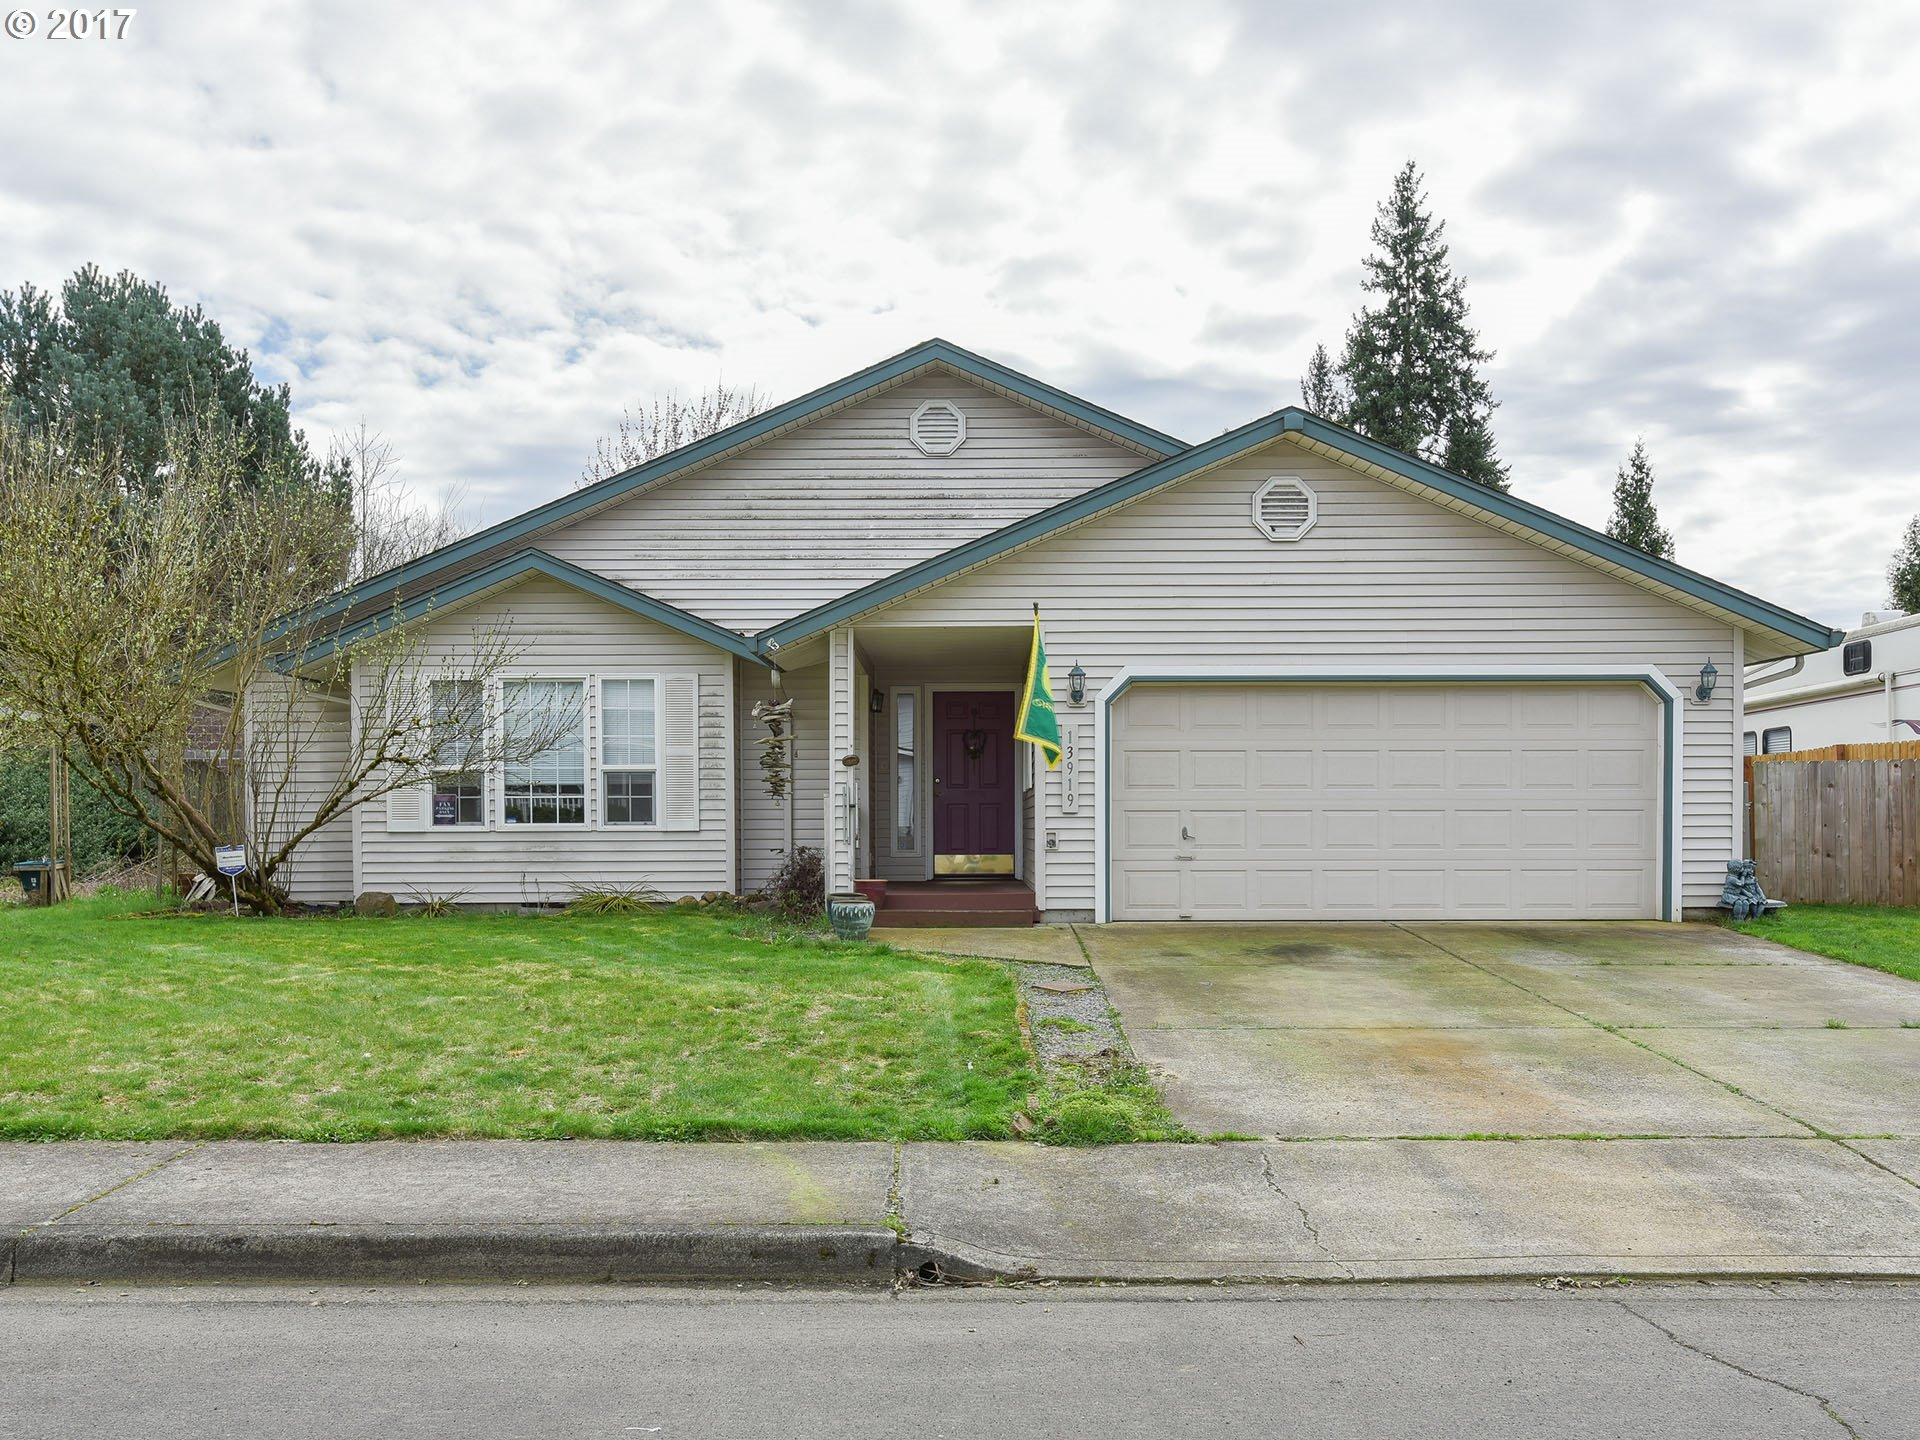 13919 NE 83RD ST, Vancouver, WA 98682